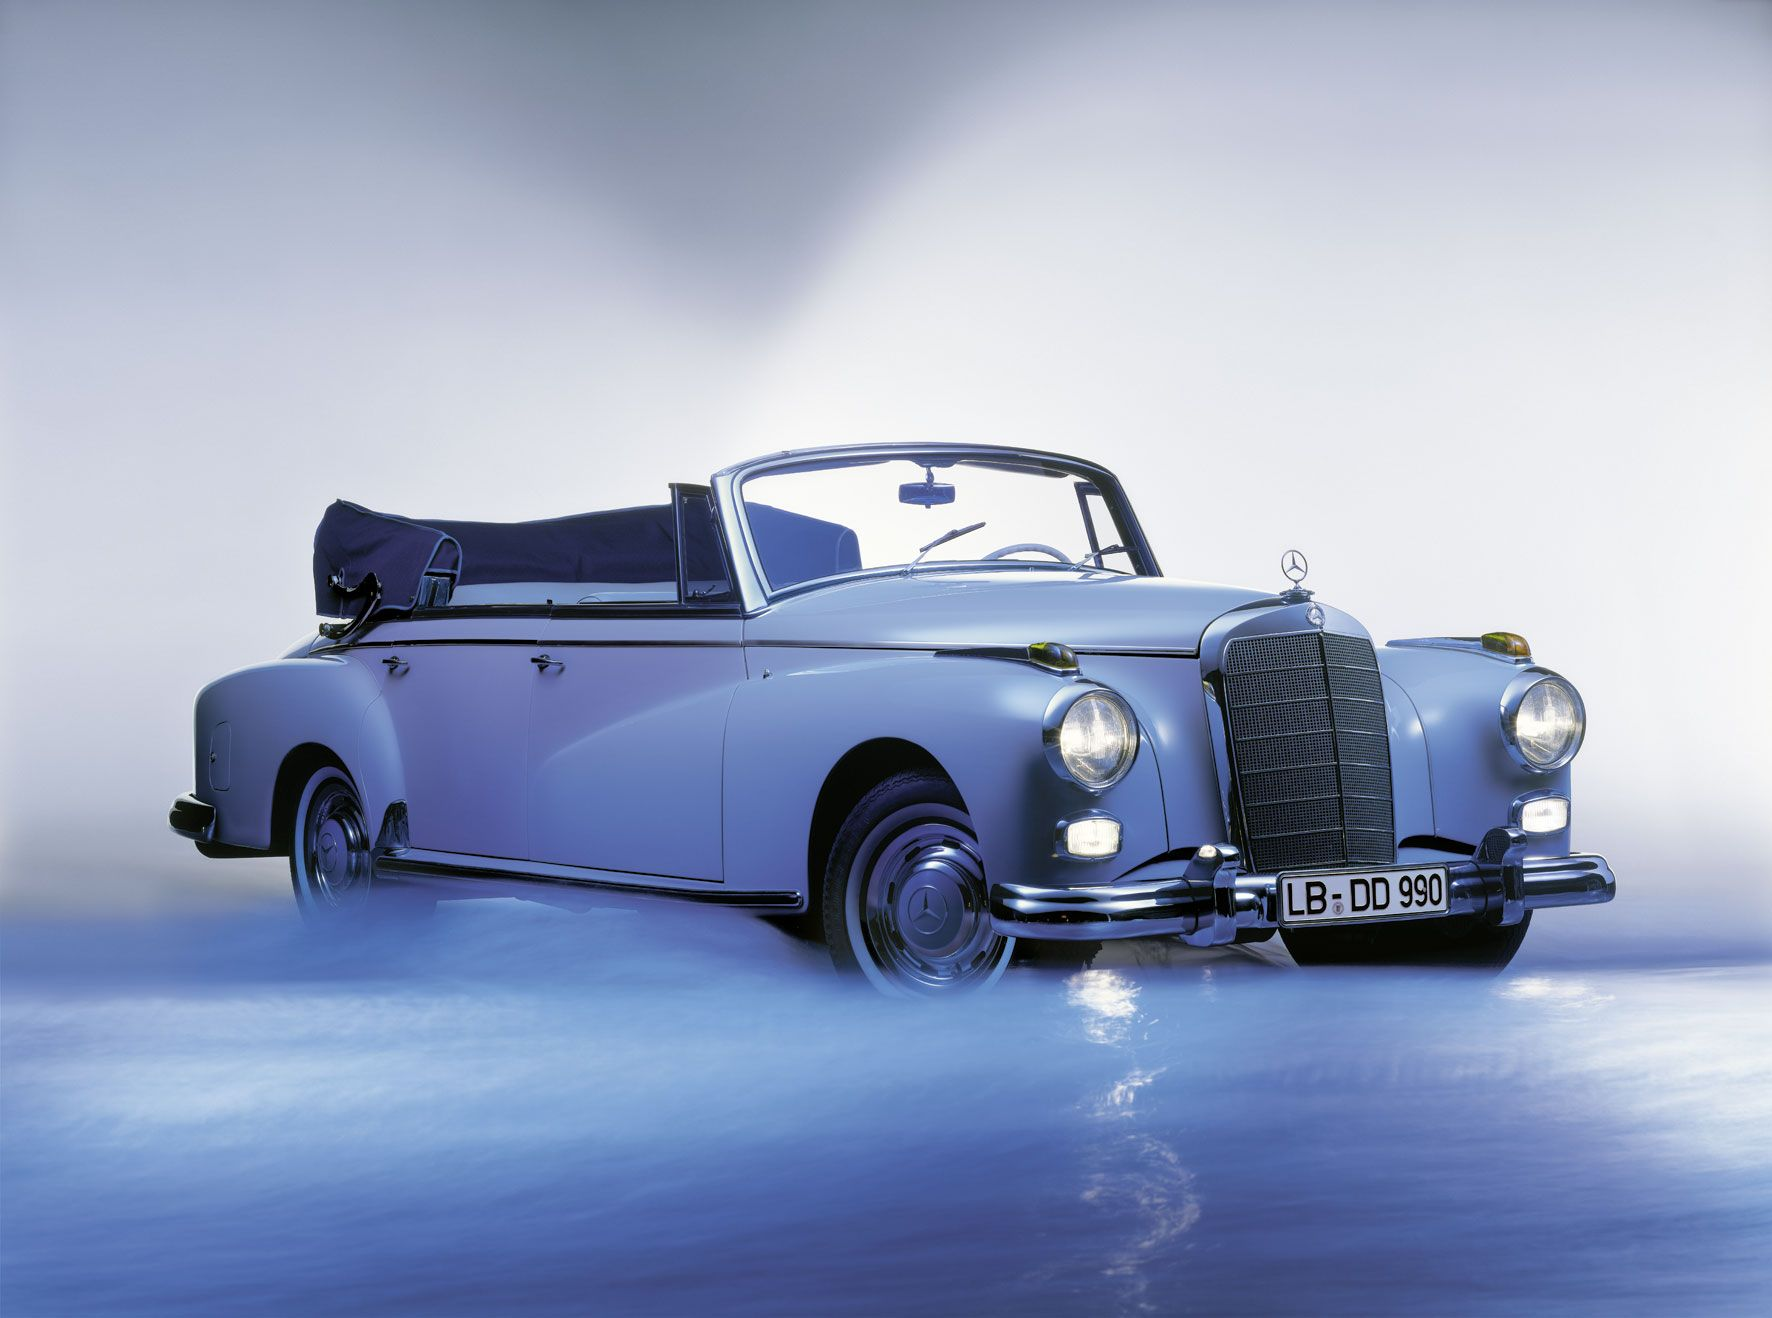 Mercedes benz w189 300 cabriolet d 1958 smcars car mercedes benz w189 300 cabriolet d 1958 smcars car malvernweather Choice Image